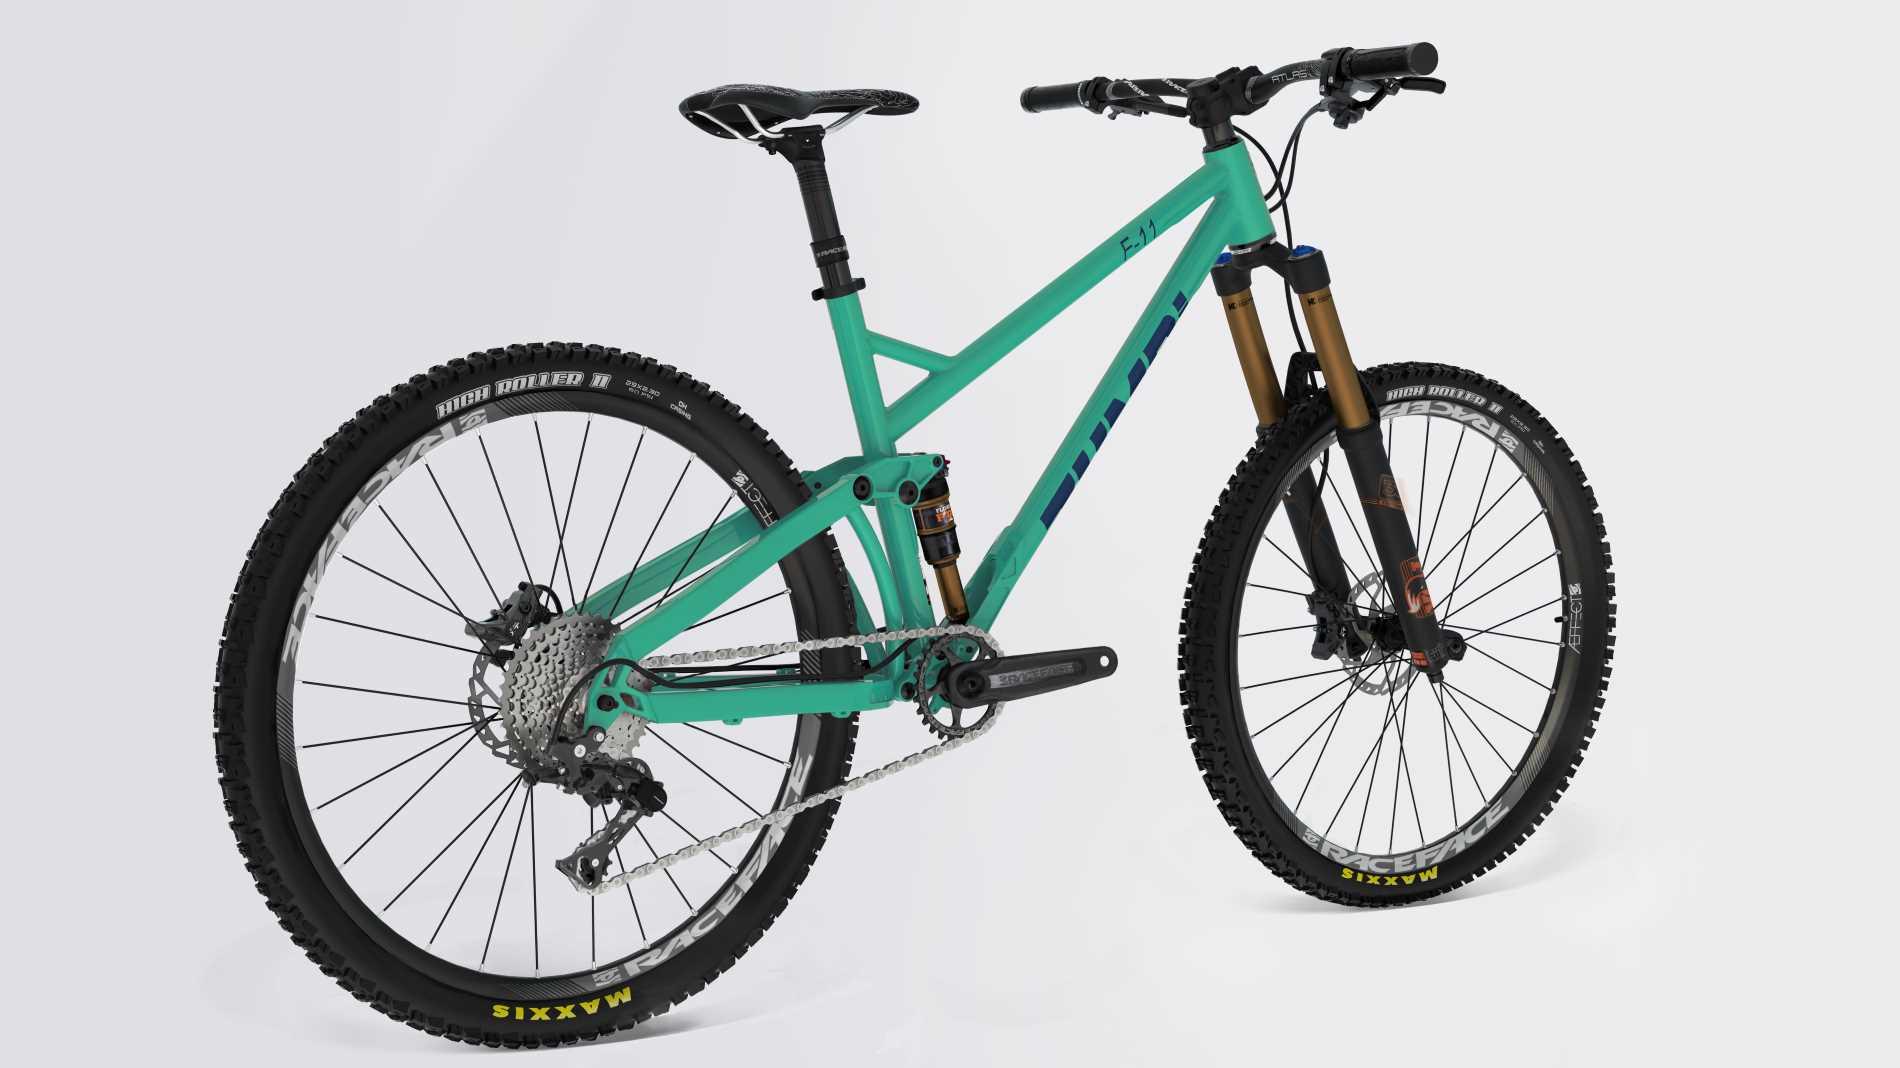 mtb bike 29 fox zumbi cycles racing front